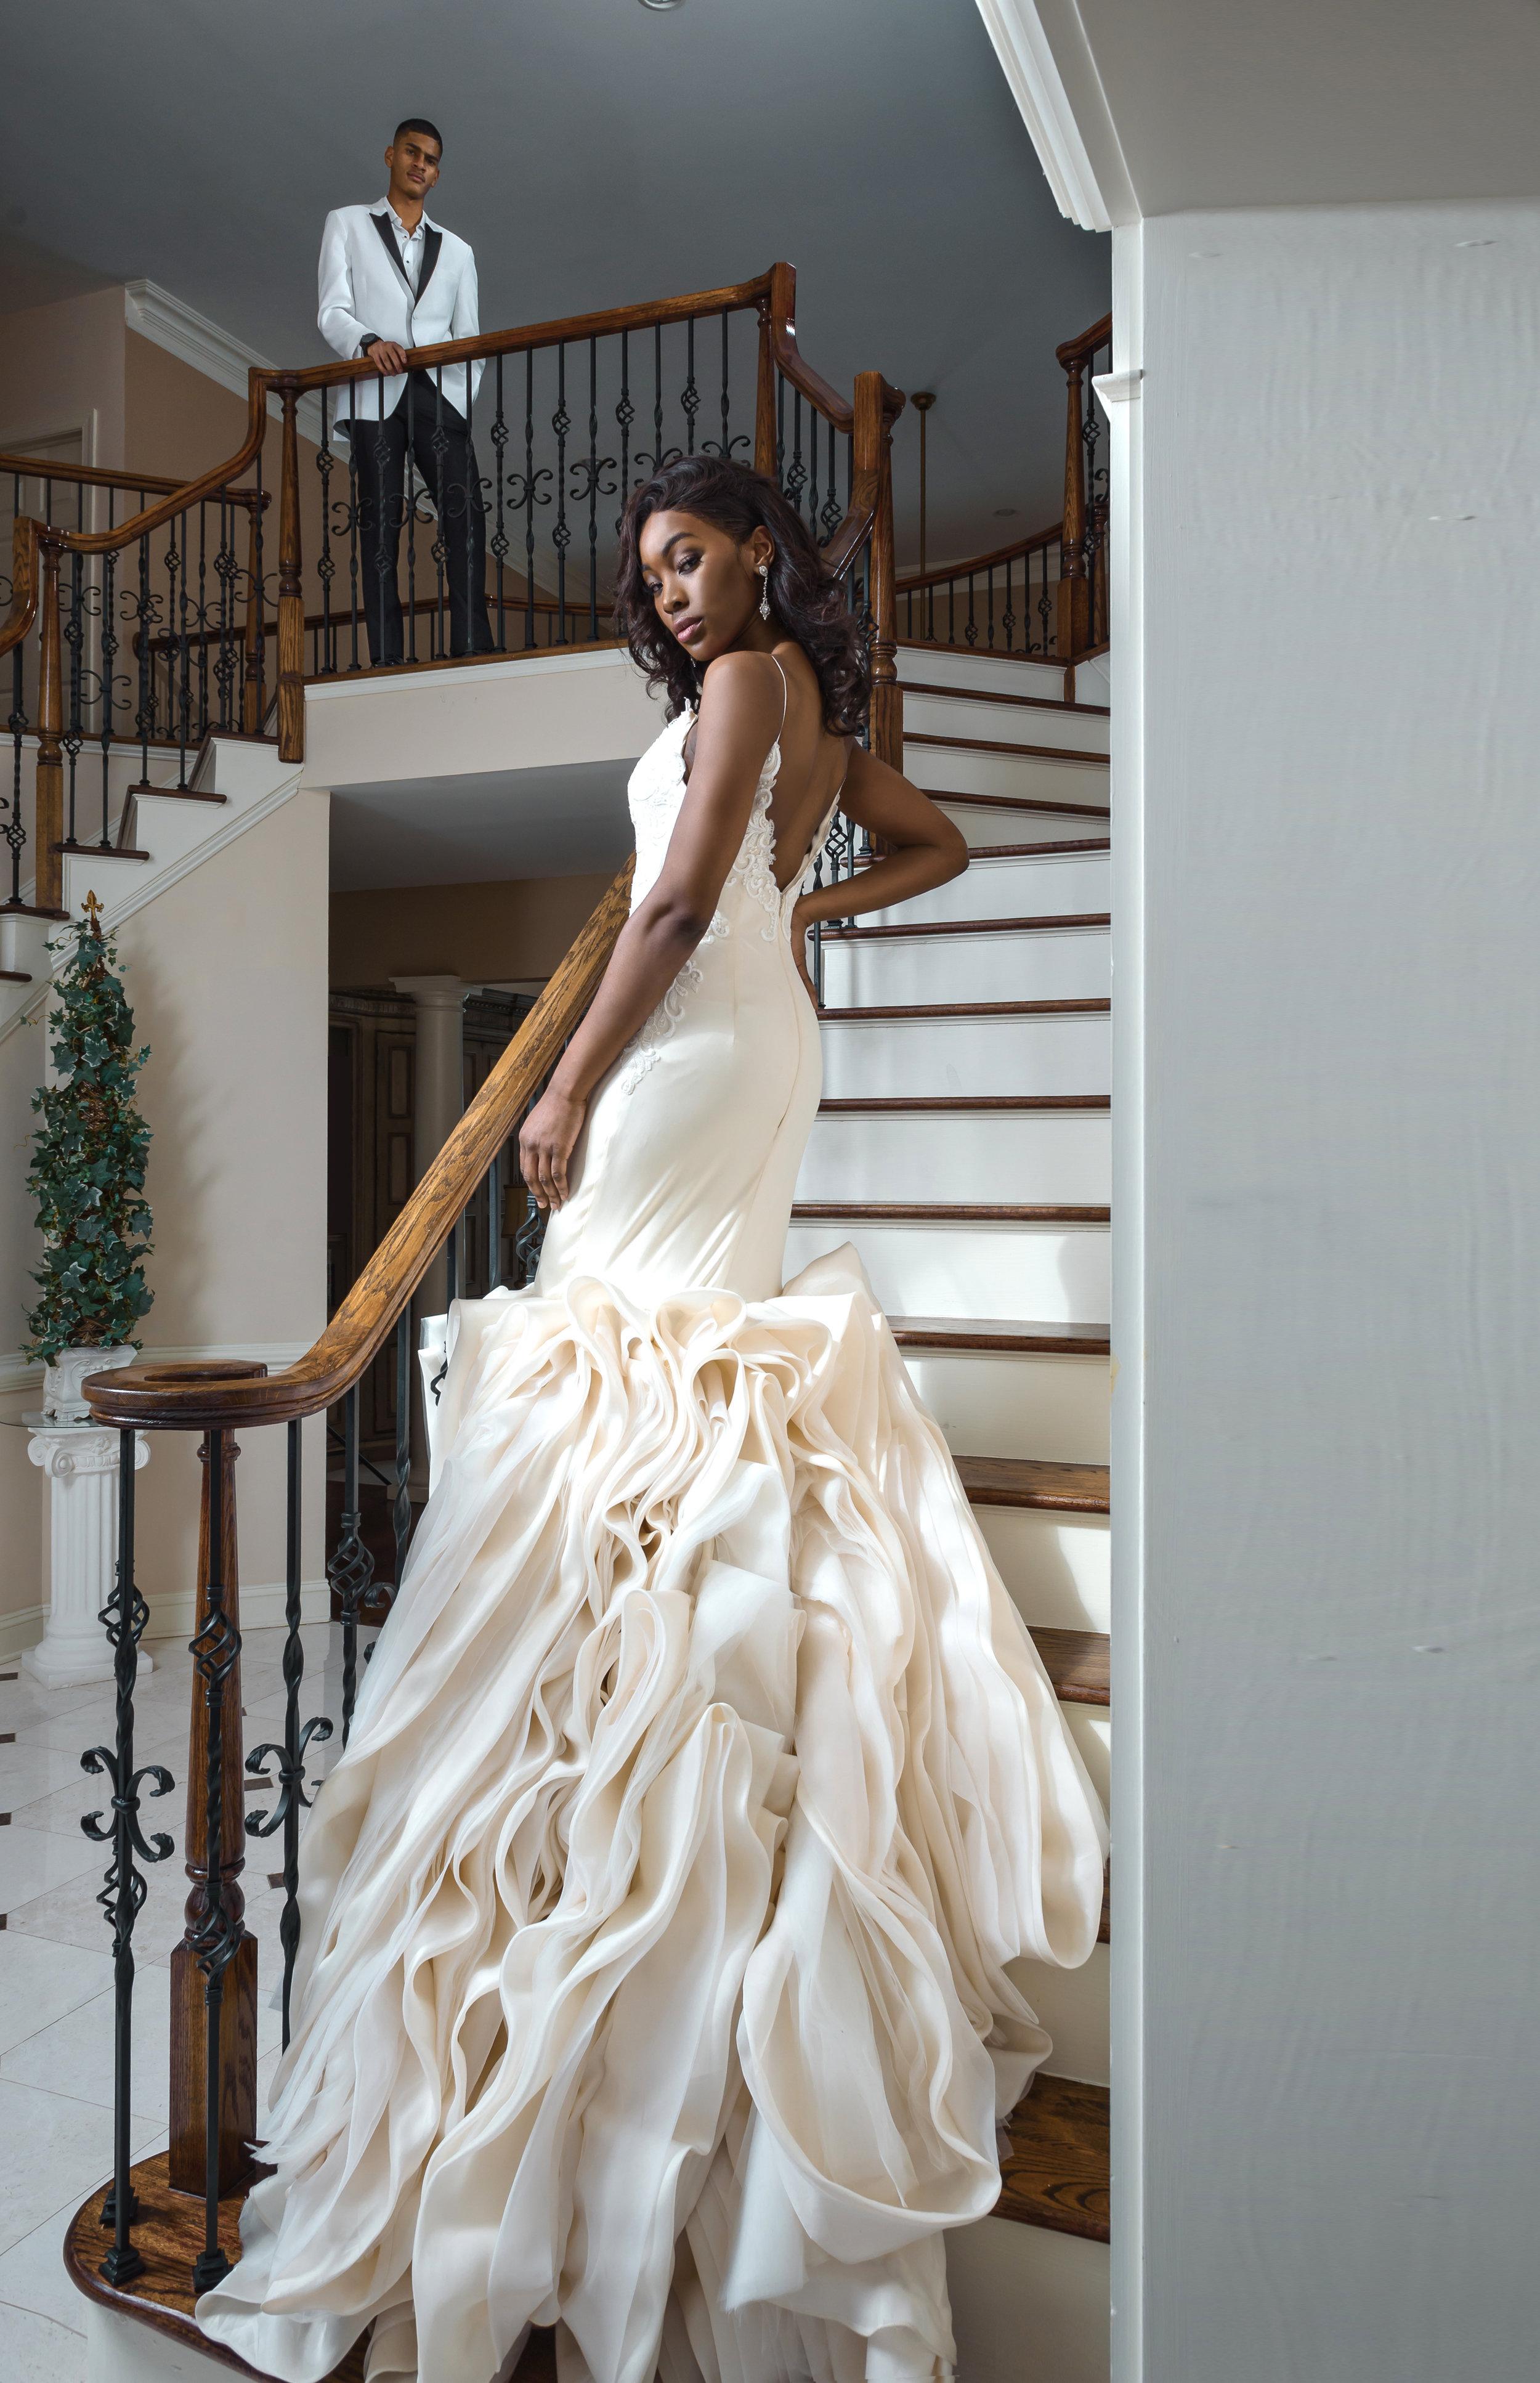 Jean_Ralph_Thurin_editorial_photo_shoot_Aly_Kuler_Fashion_Photographer-8757.jpg